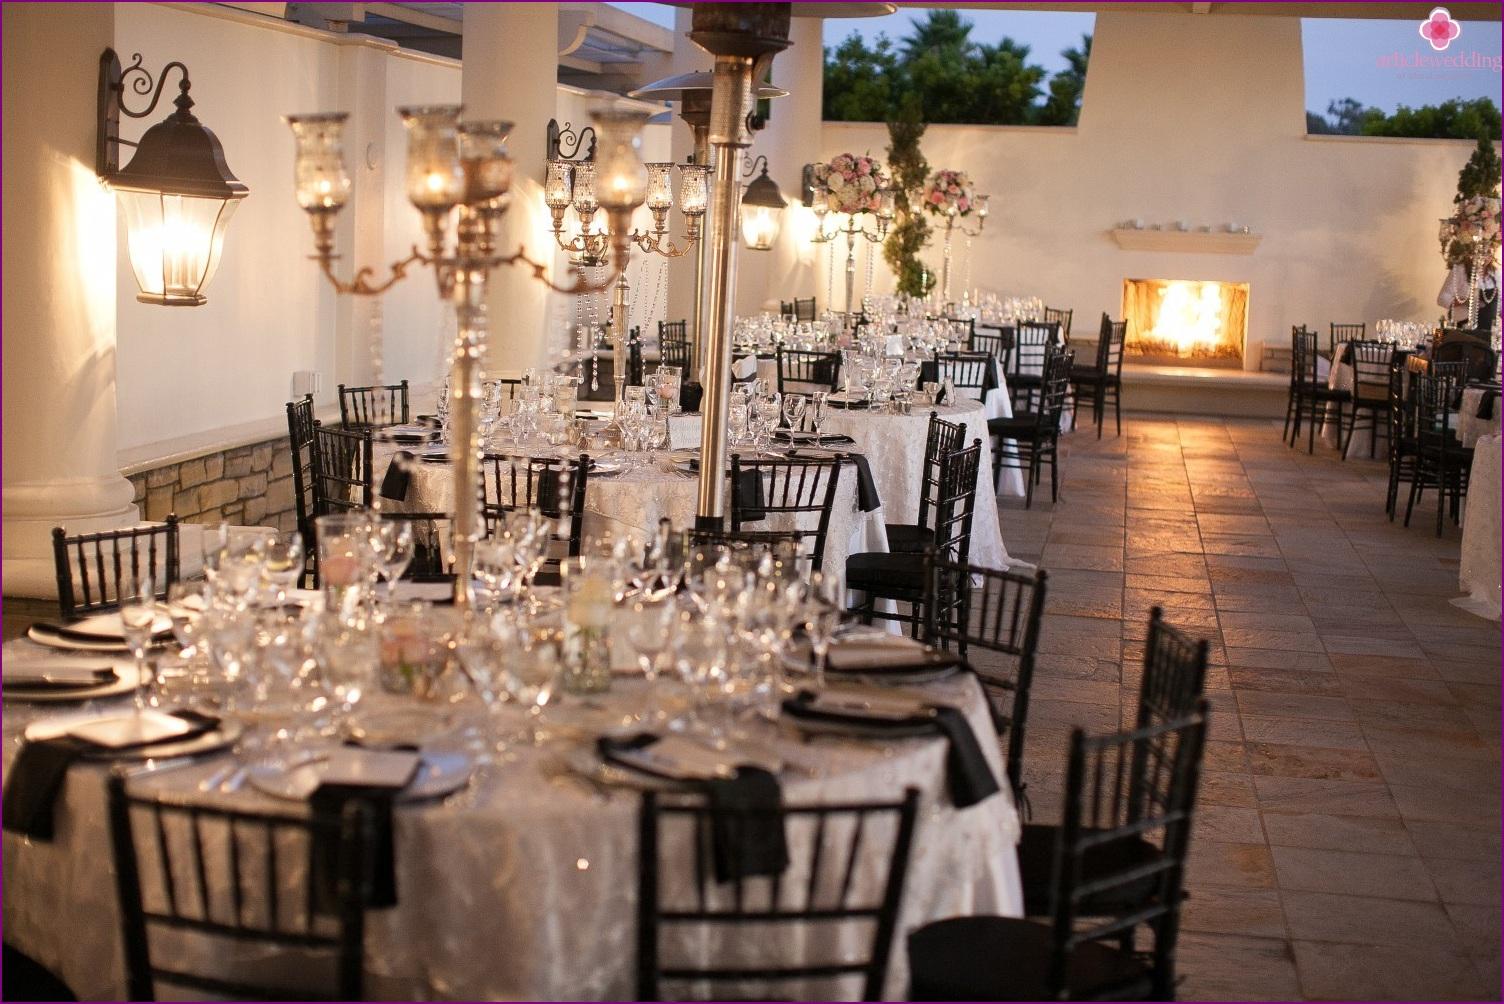 Chanel-style wedding banquet decoration